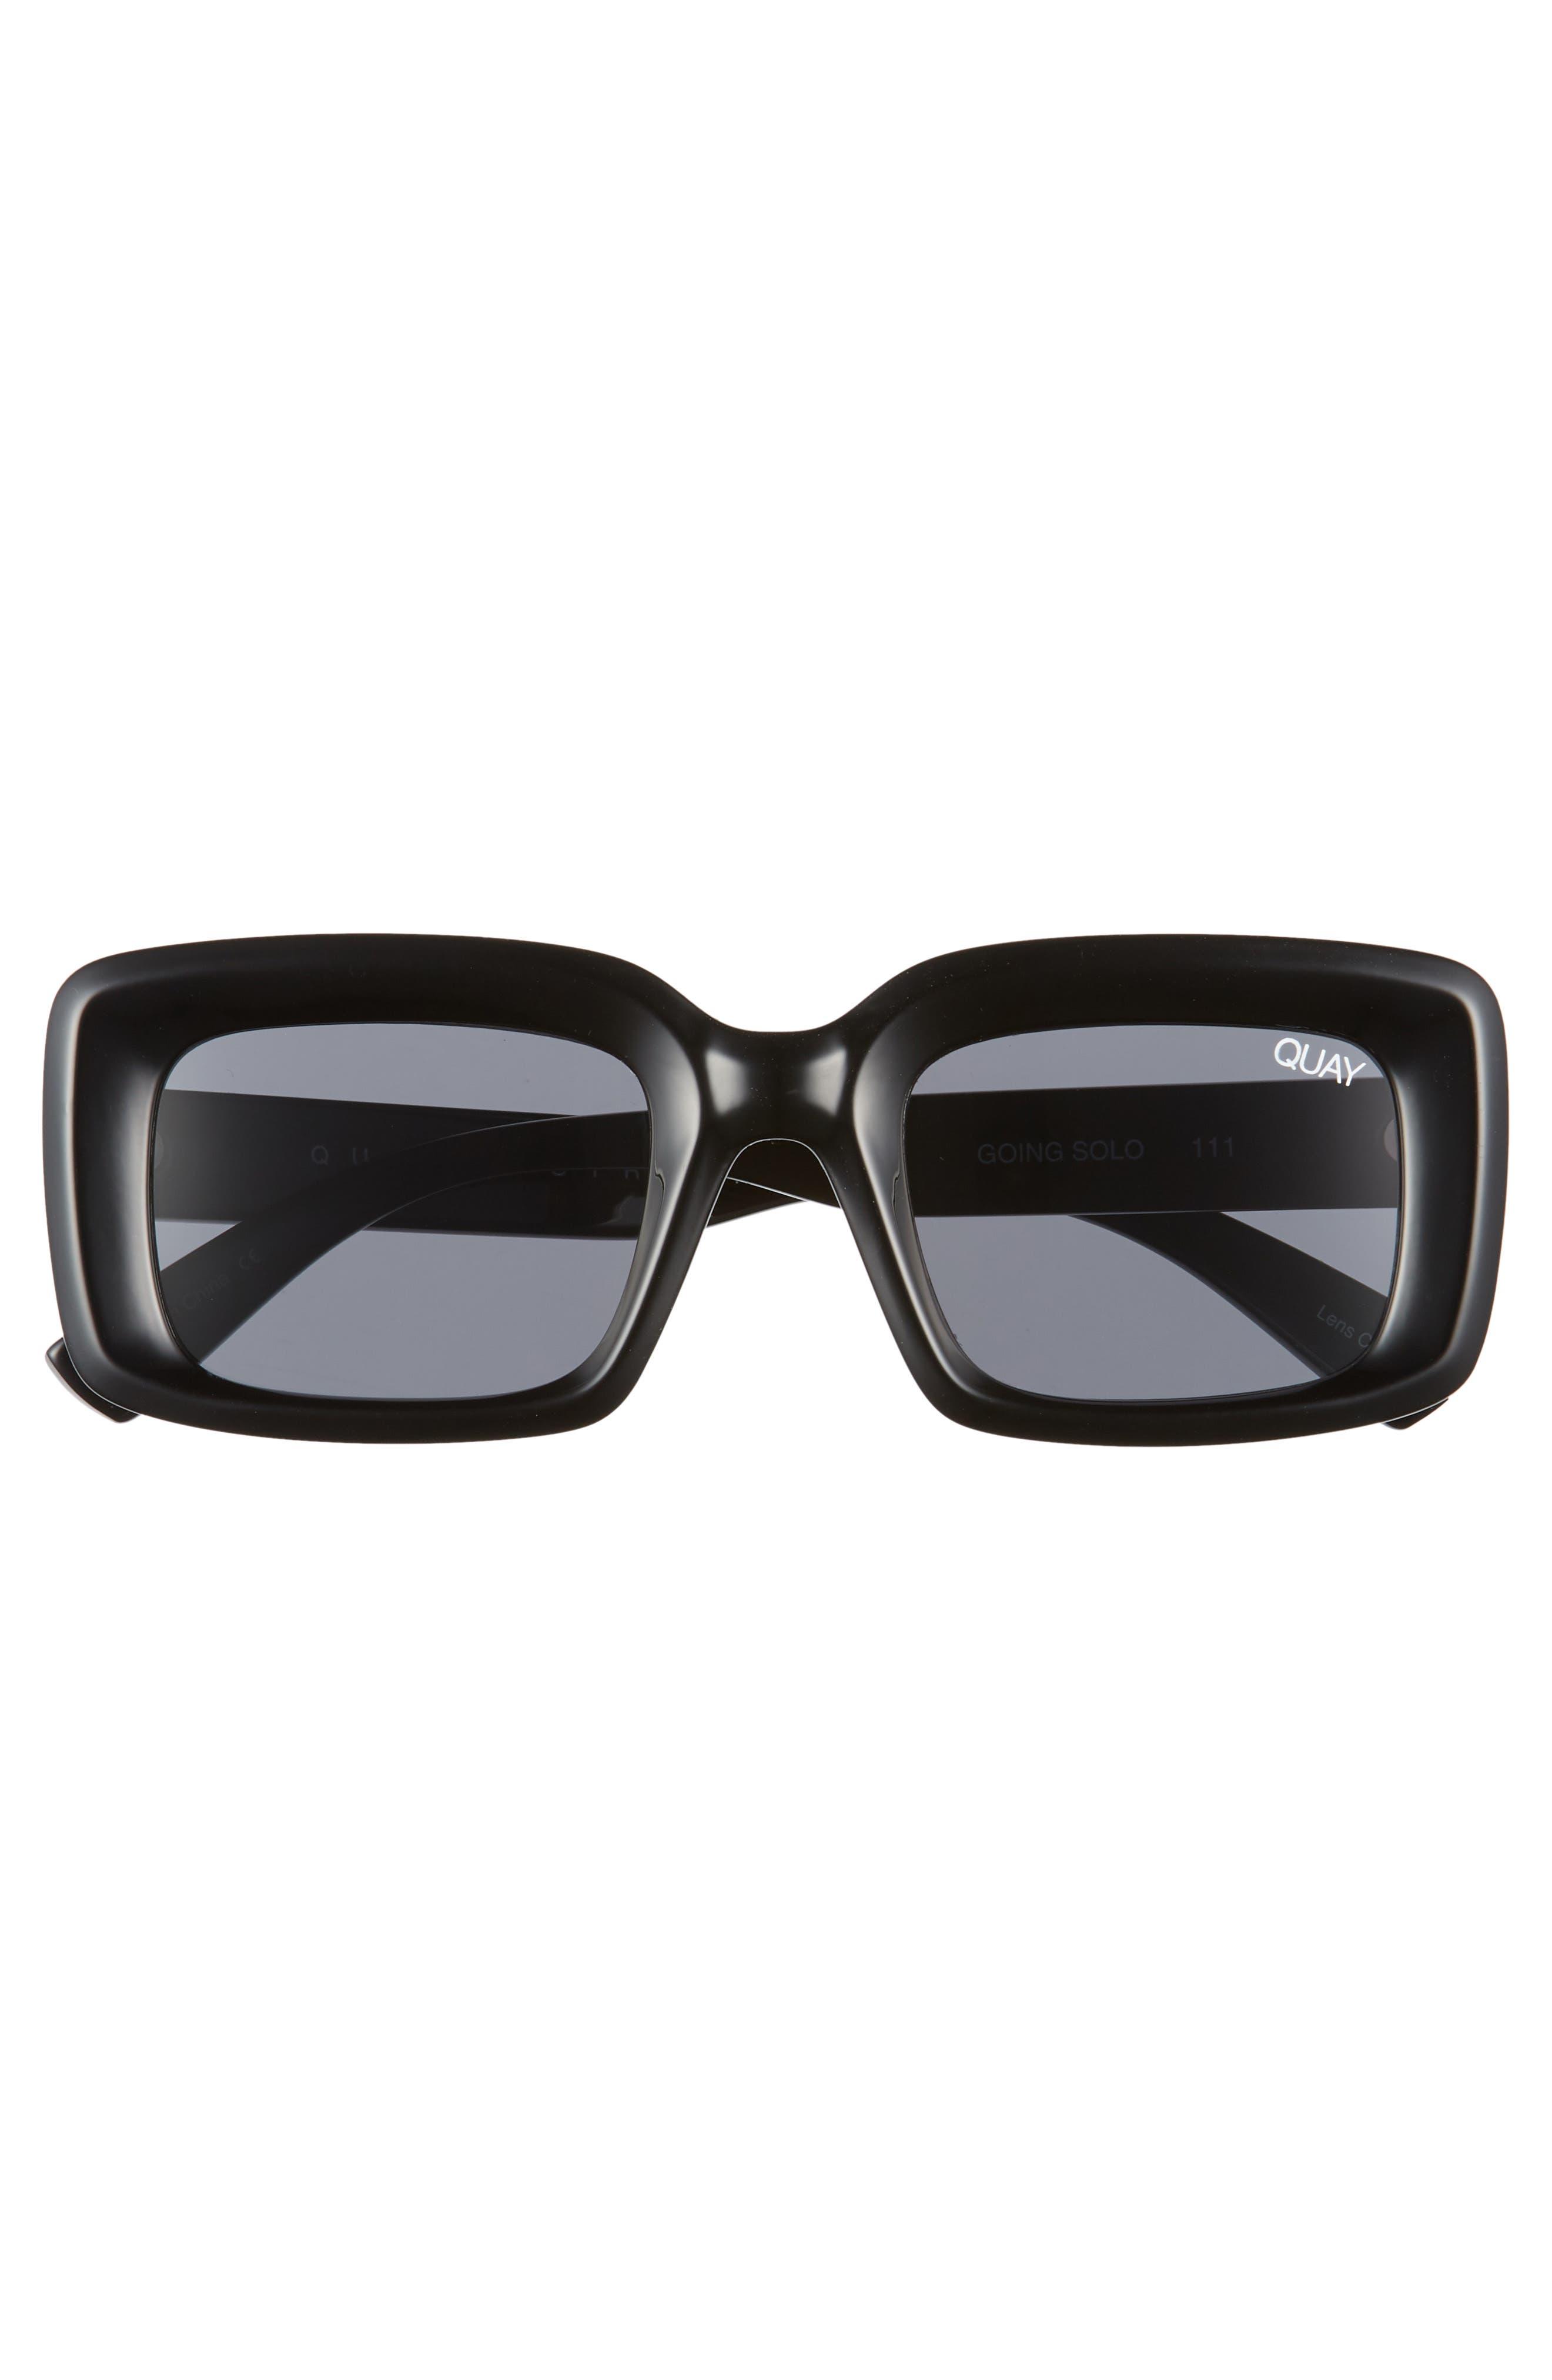 Going Solo 48mm Square Sunglasses,                             Alternate thumbnail 3, color,                             BLACK/ SMOKE